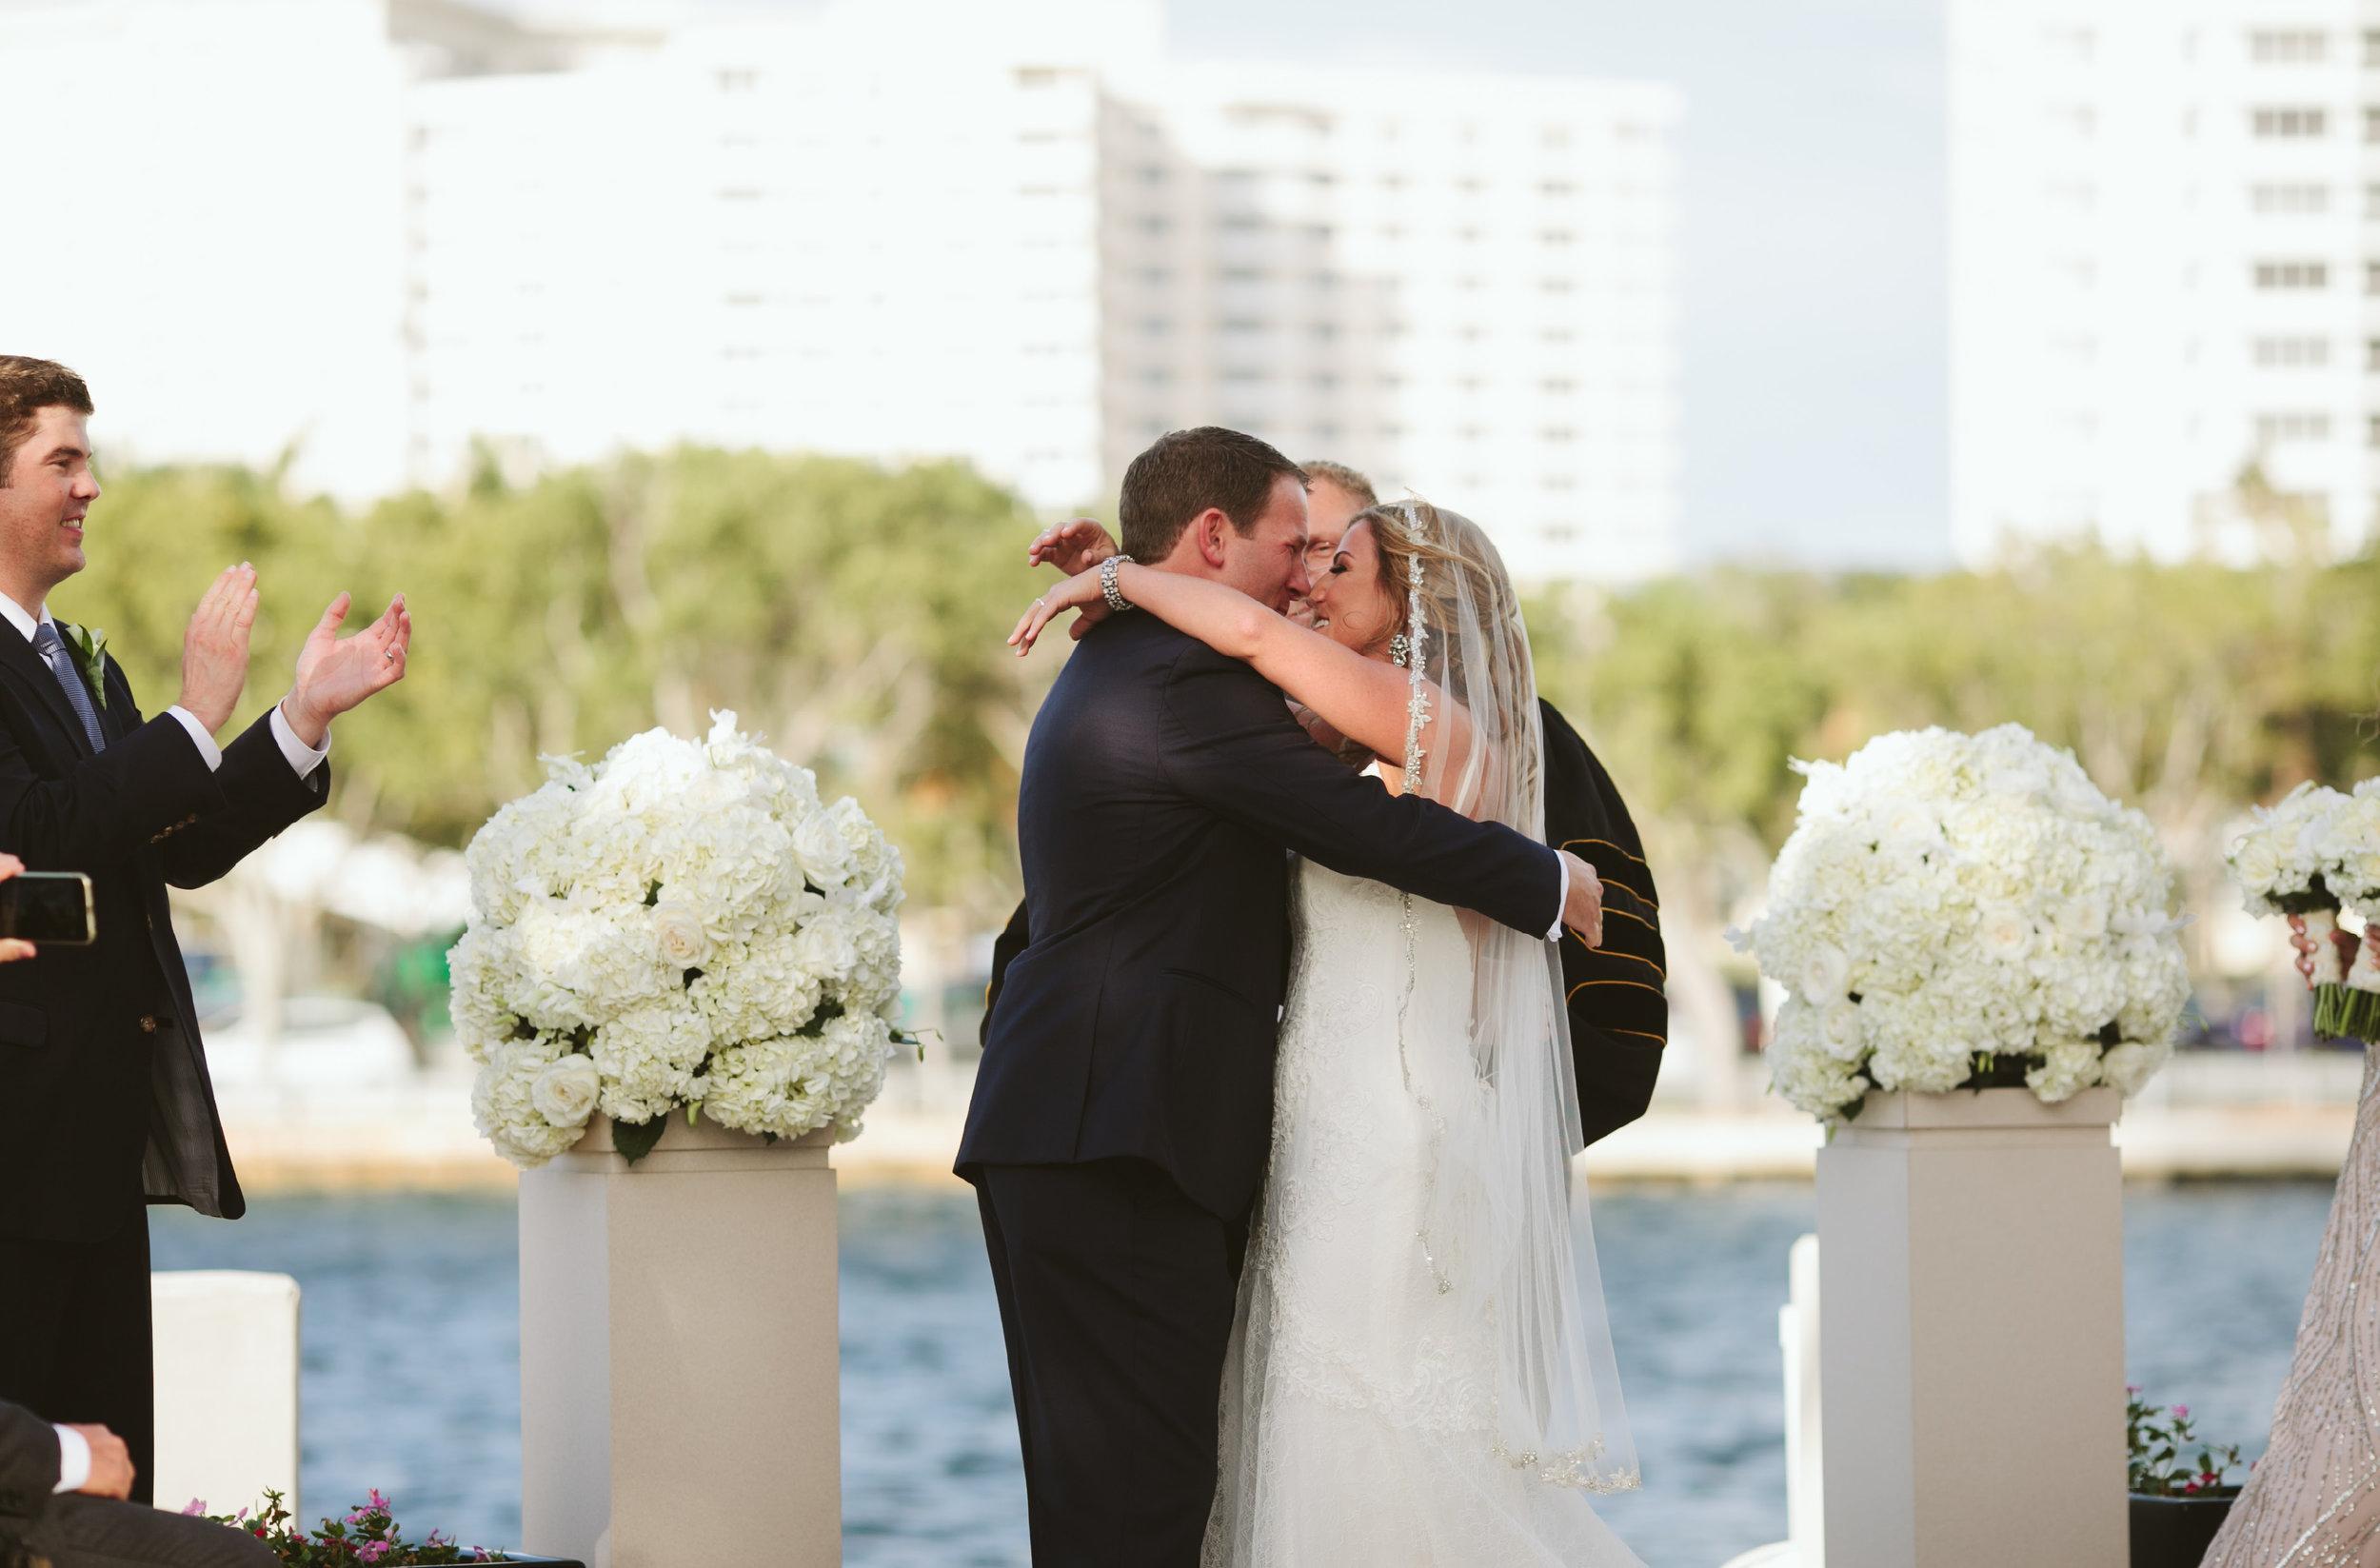 Kim + John's Wedding at the Waterstone Hotel in Boca Raton55.jpg